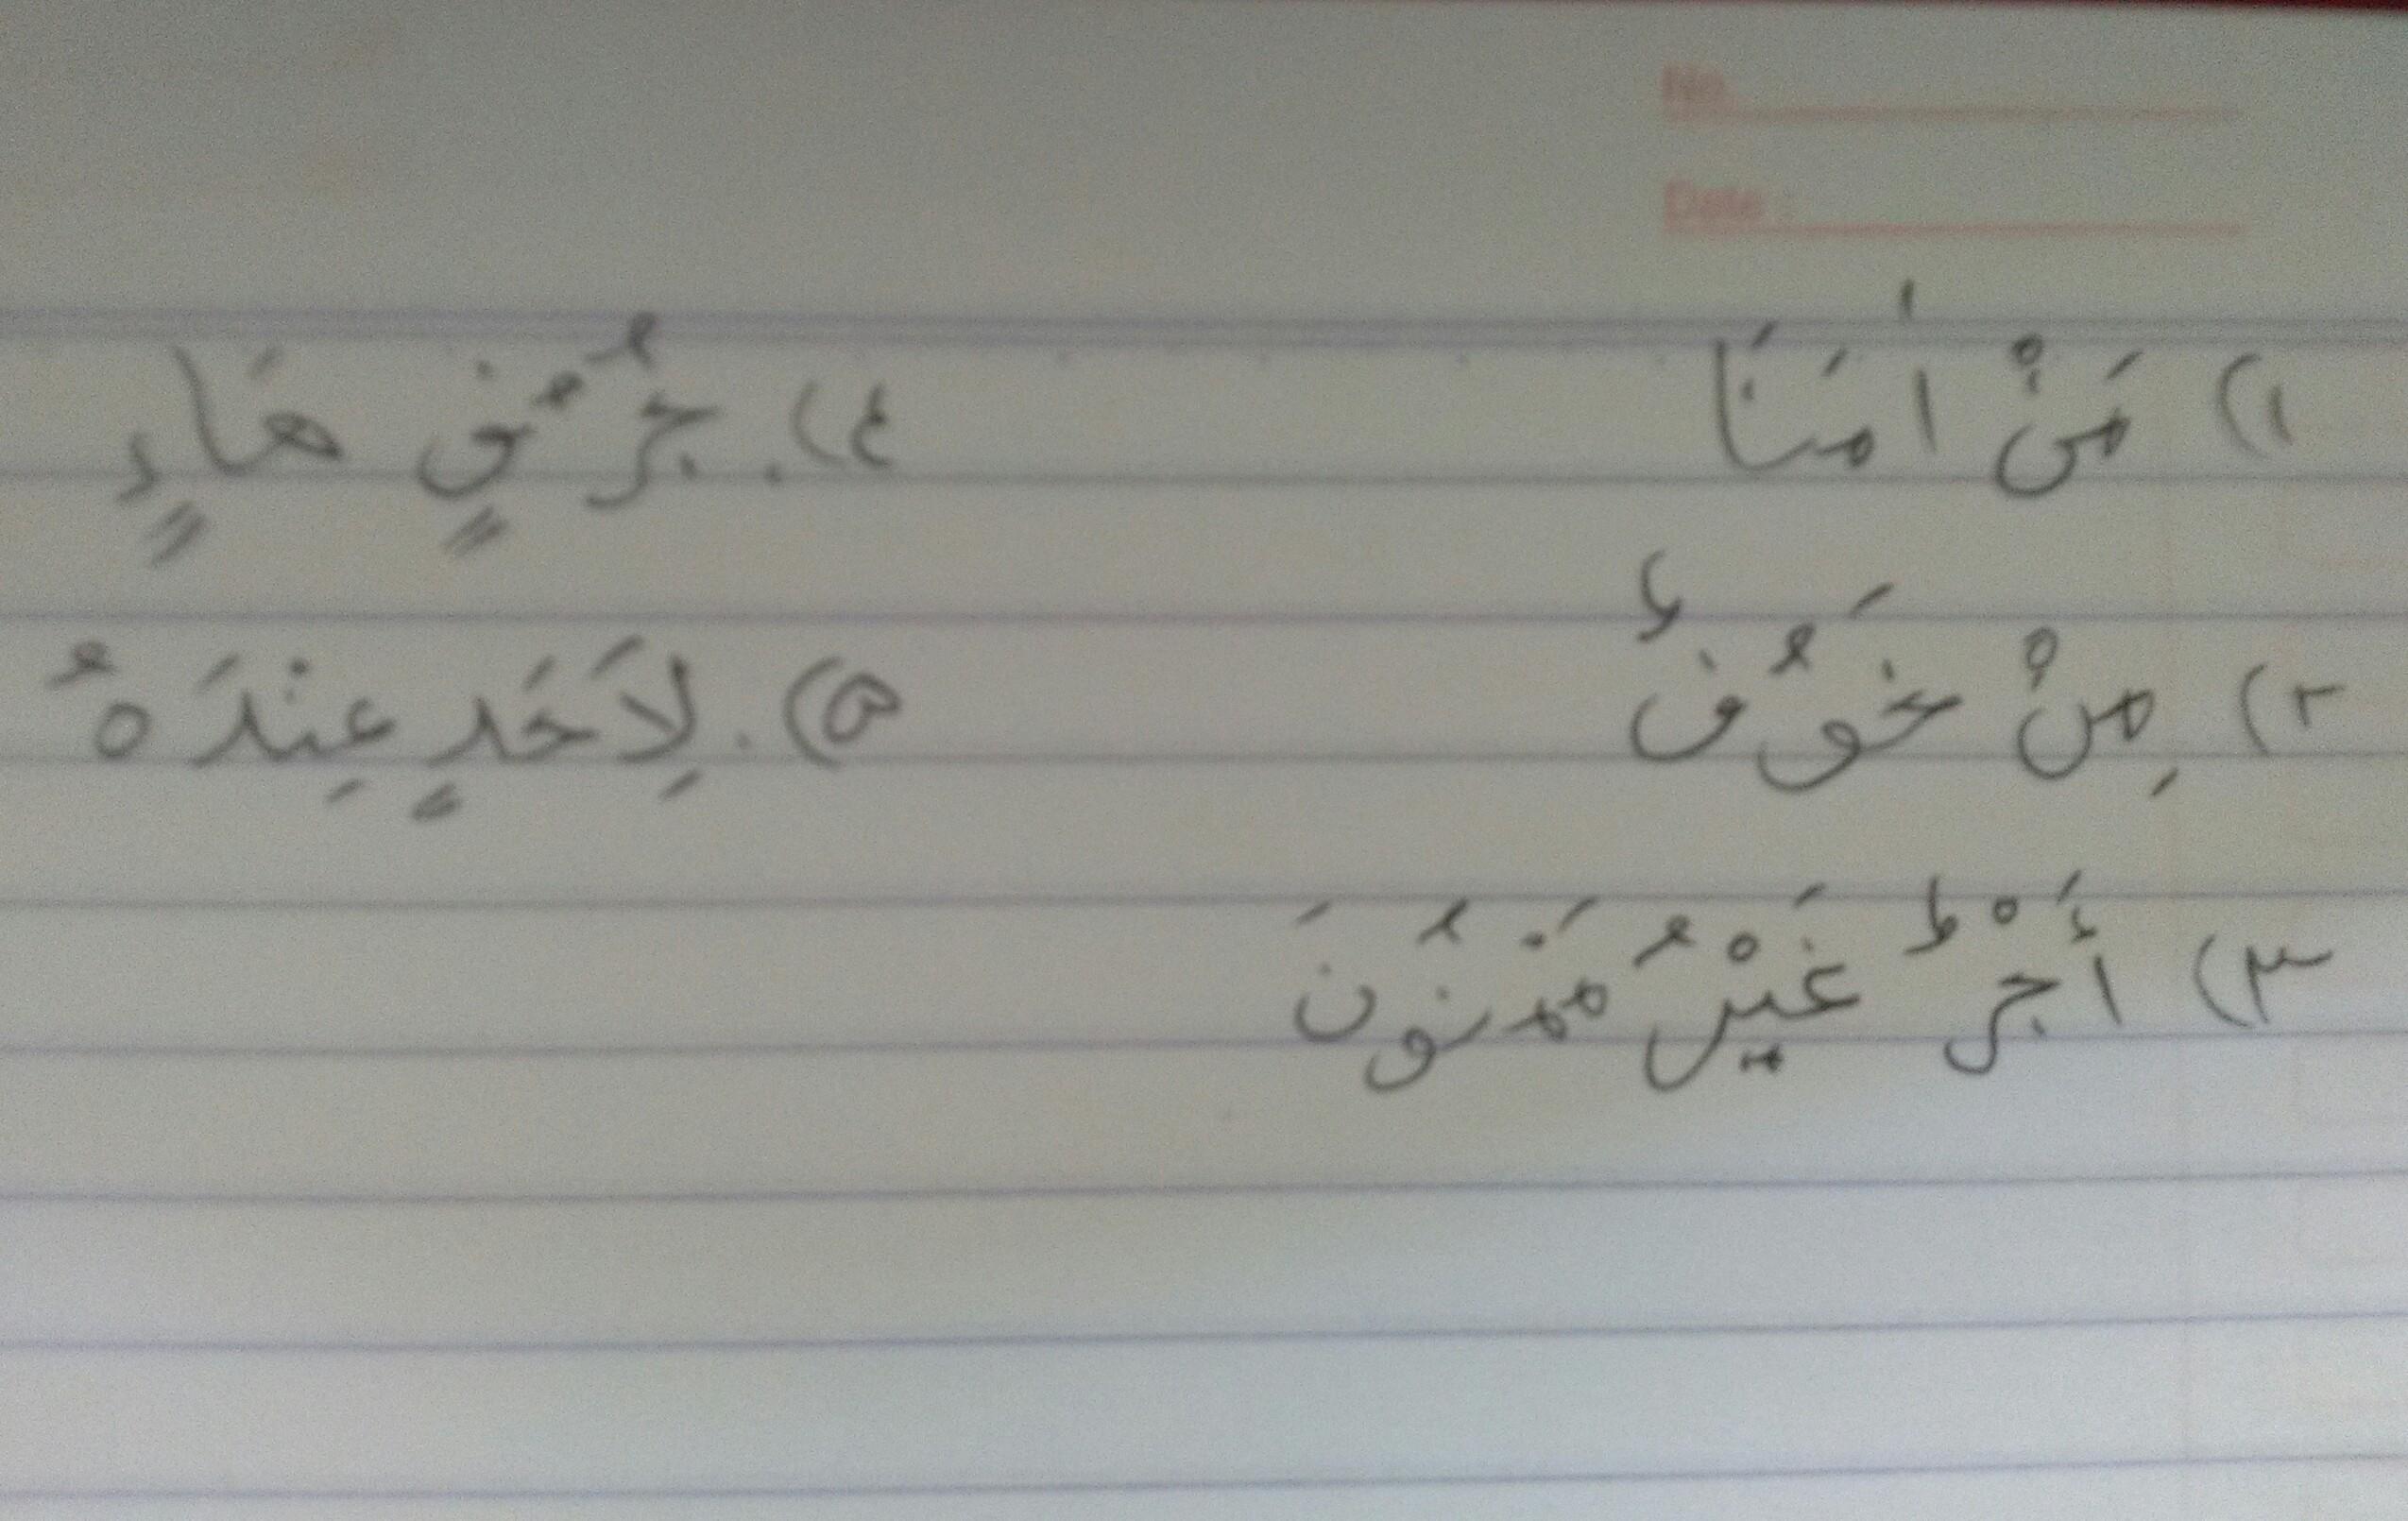 Contoh Bacaan Idzhar Berikan 5 Contohnya Tolong Yaa Brainly Co Id